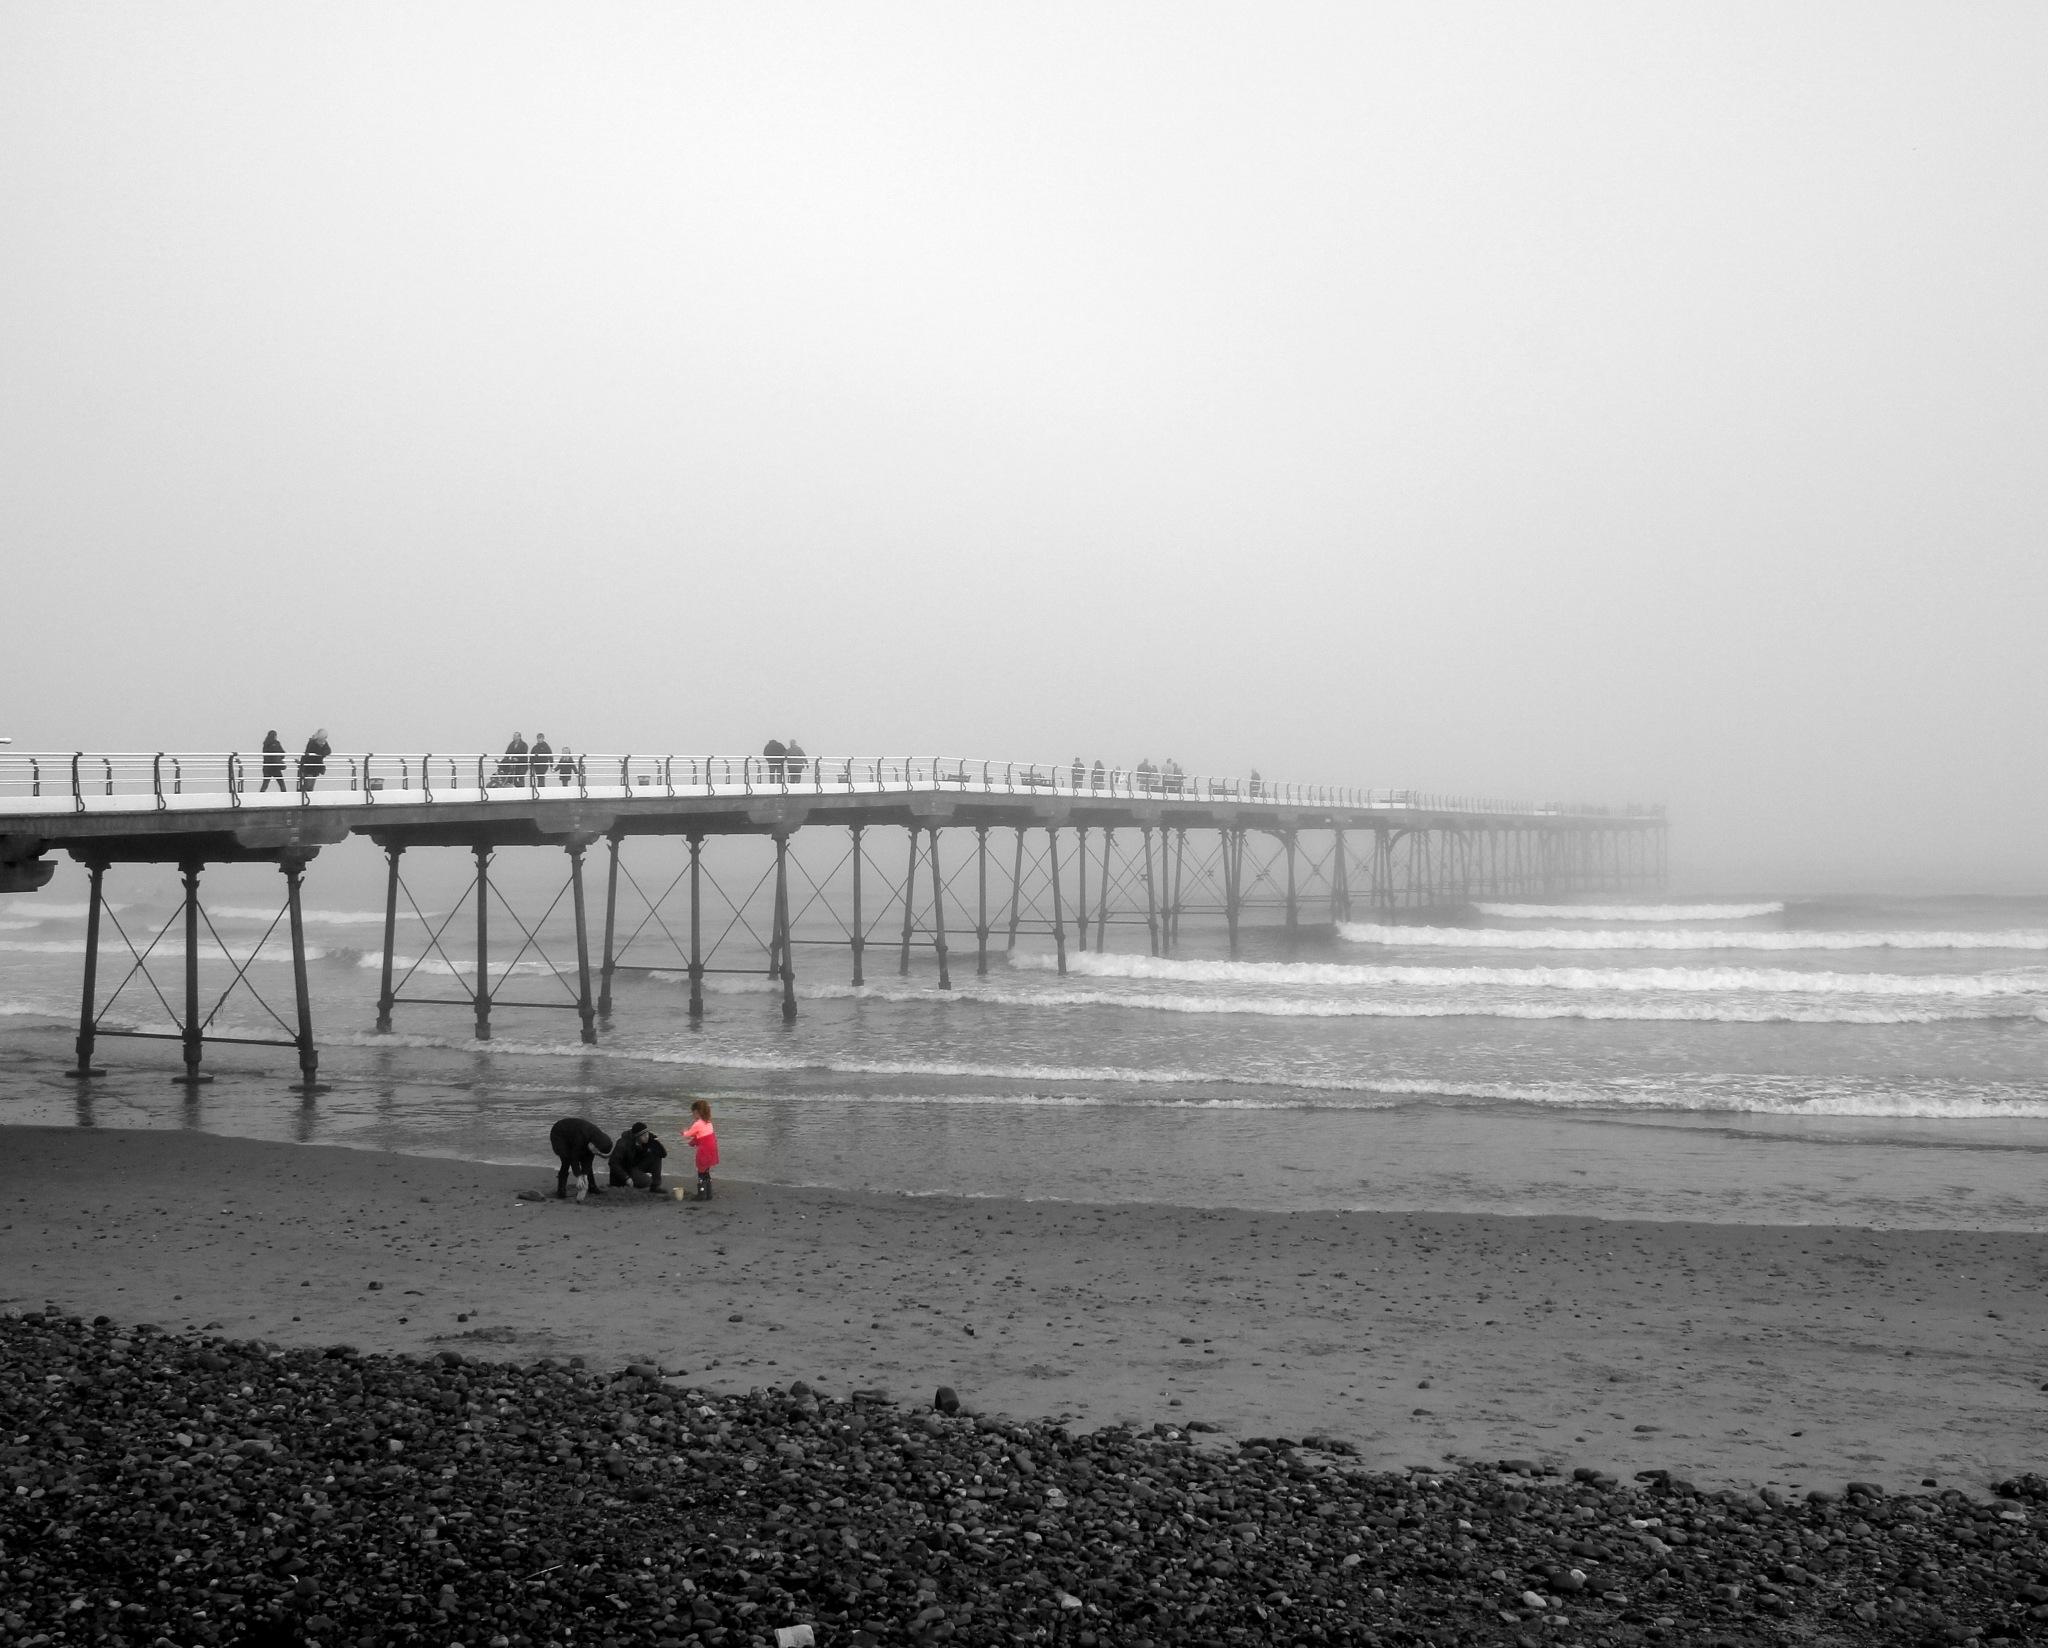 the Girl on the beach by bunts45